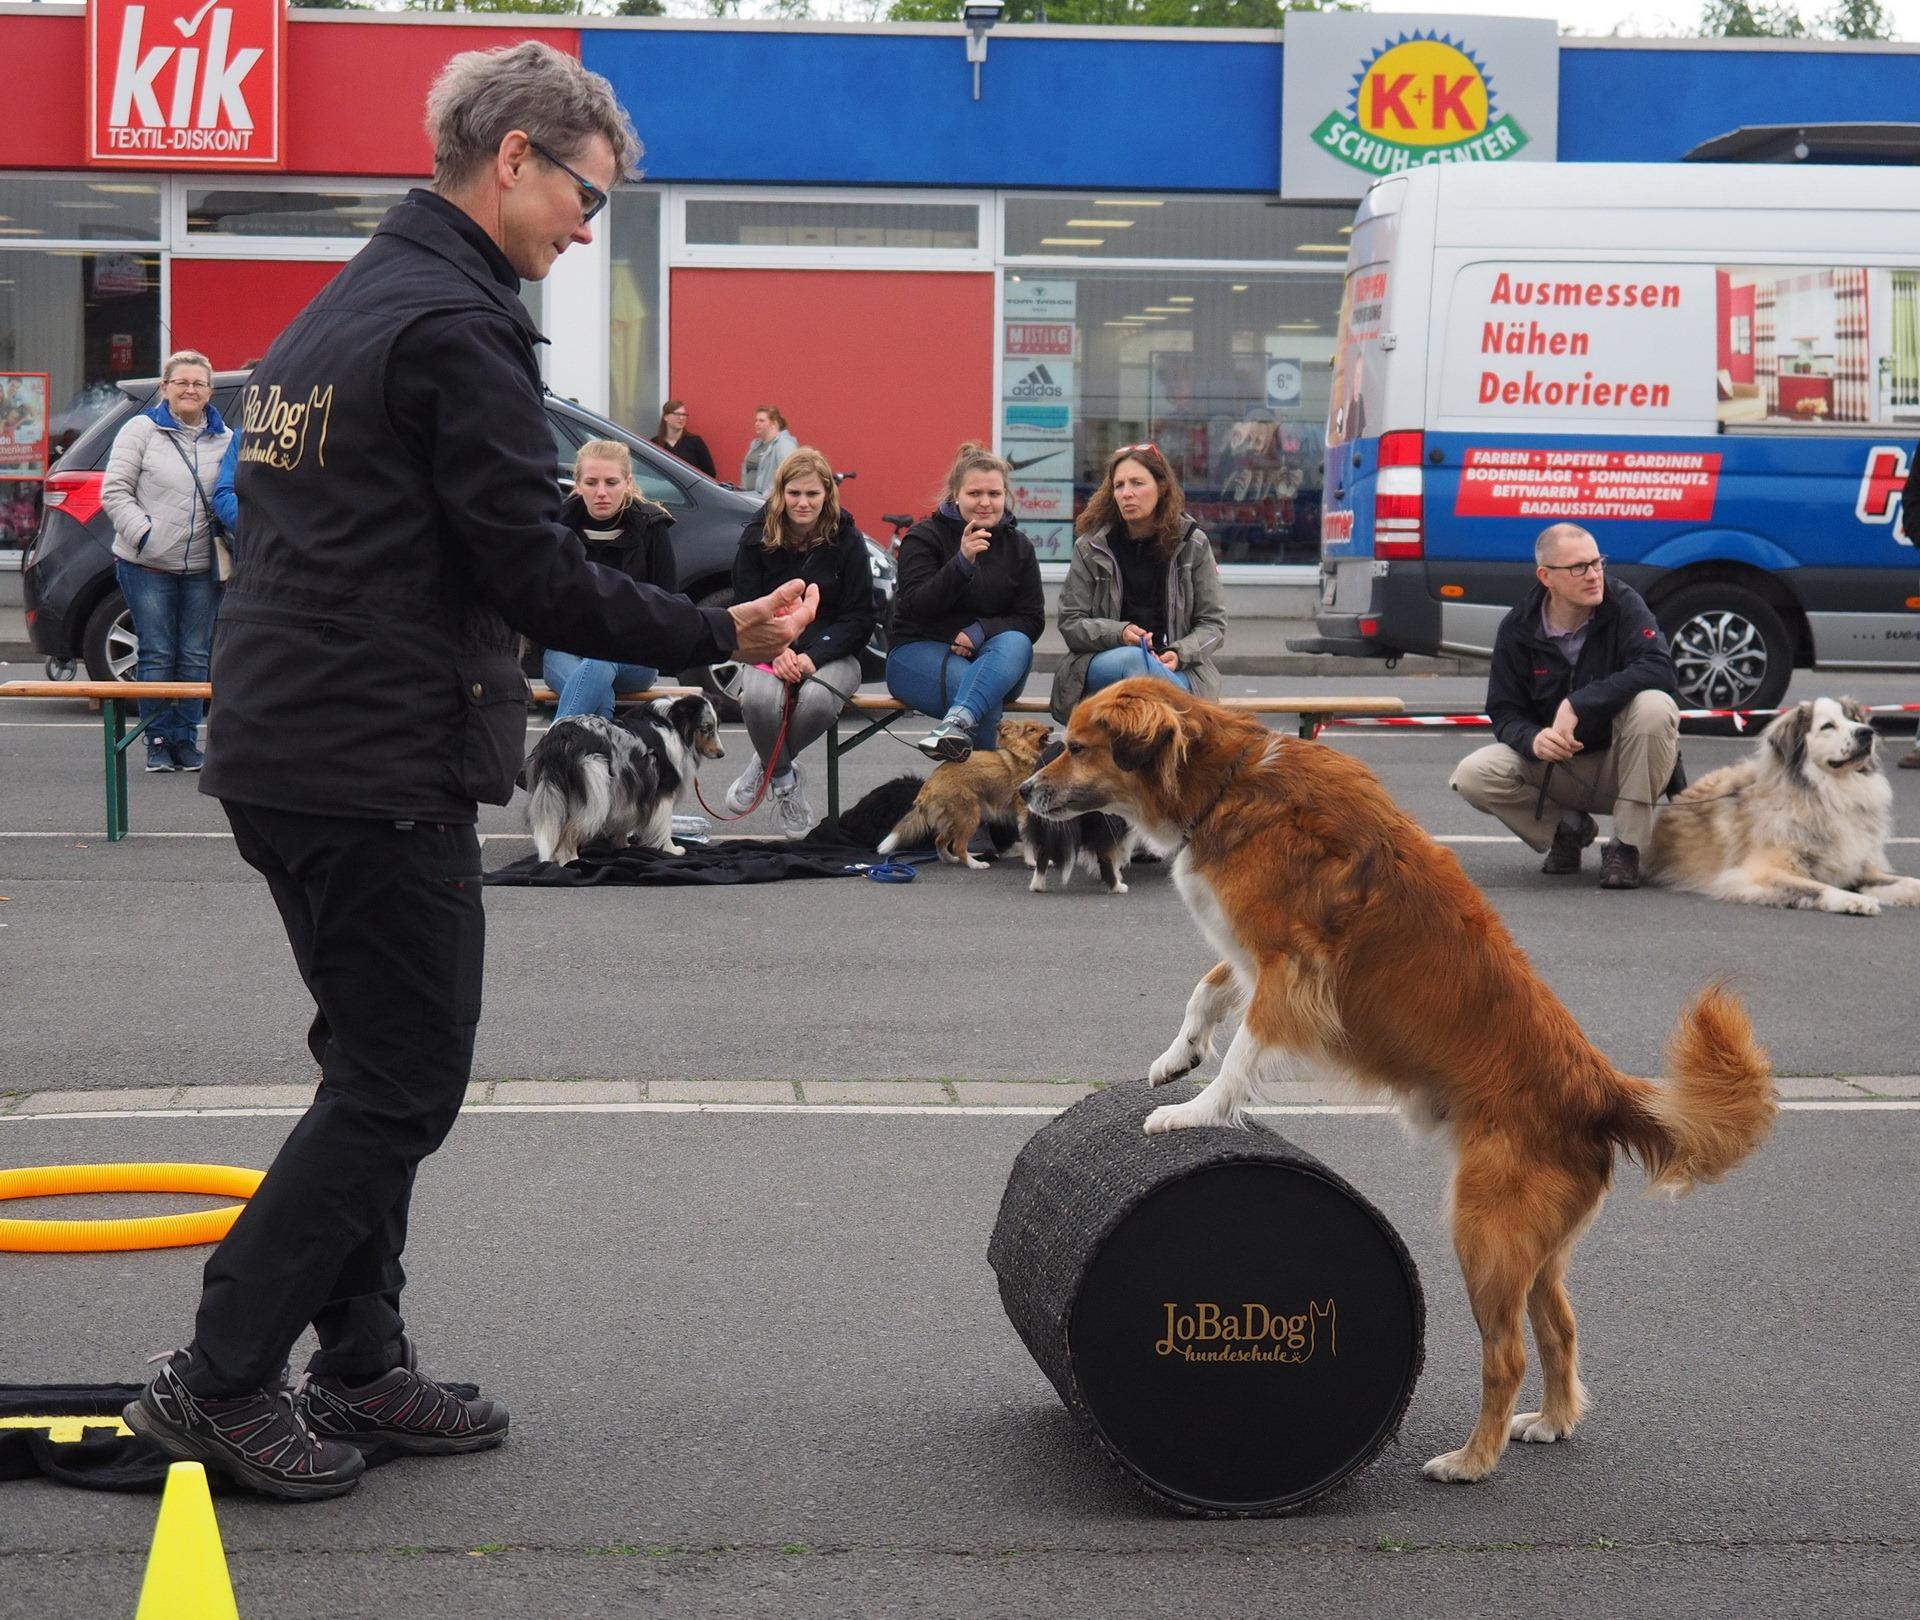 JoBaDog_Frühlingsfest_Fressnapf_Oranienburg_2019_14.jpg